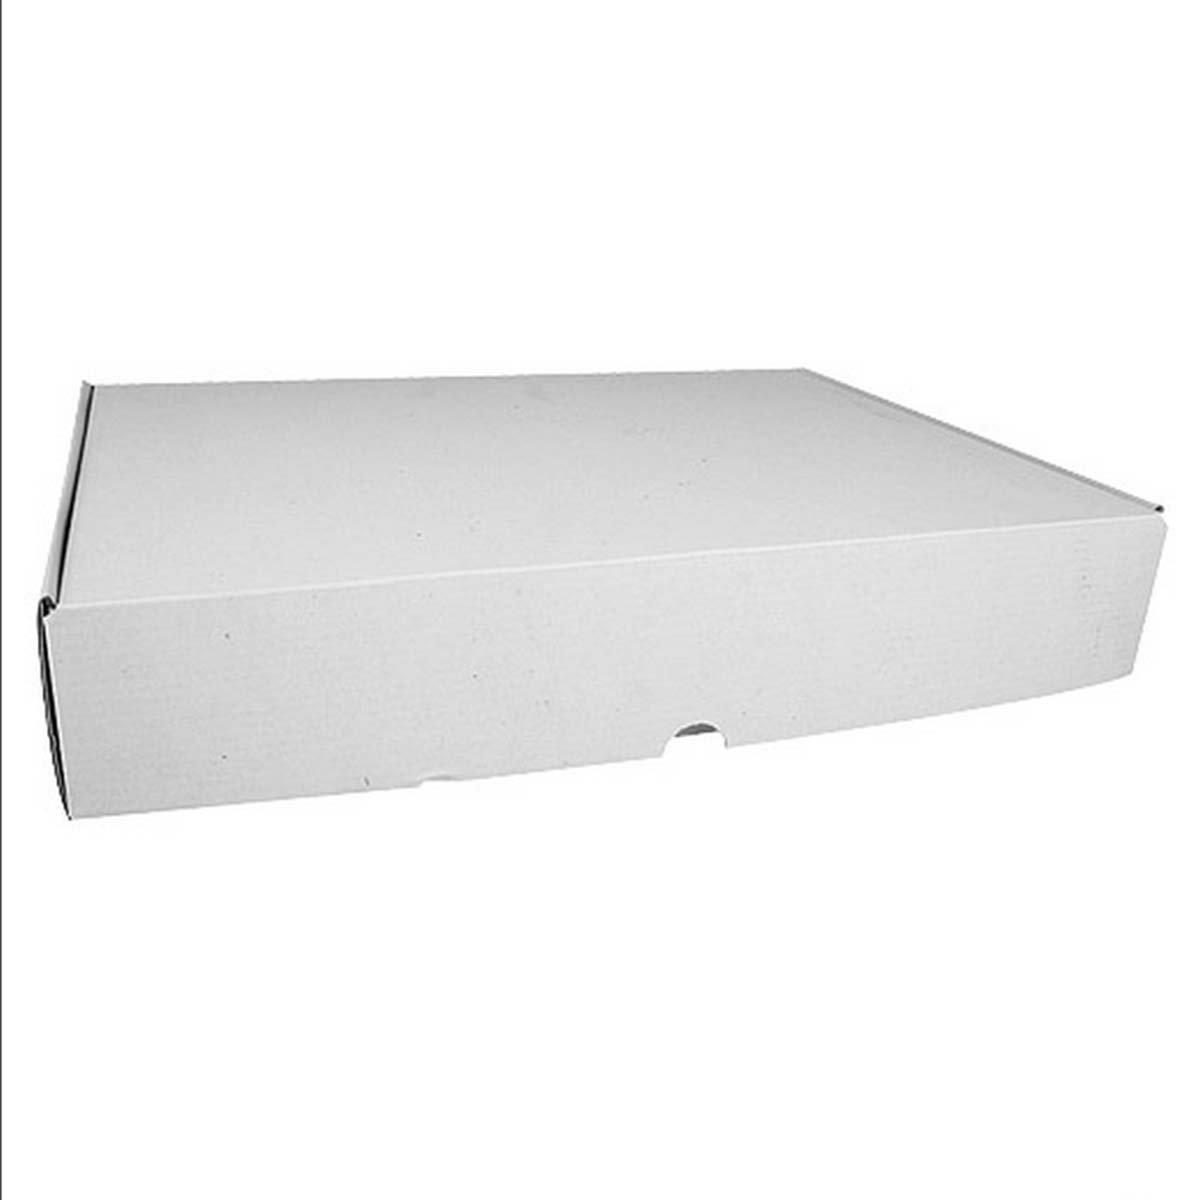 Pick d Pack - Caja carton rectangular blanca 35x26x6cm con tapa: Amazon.es: Hogar